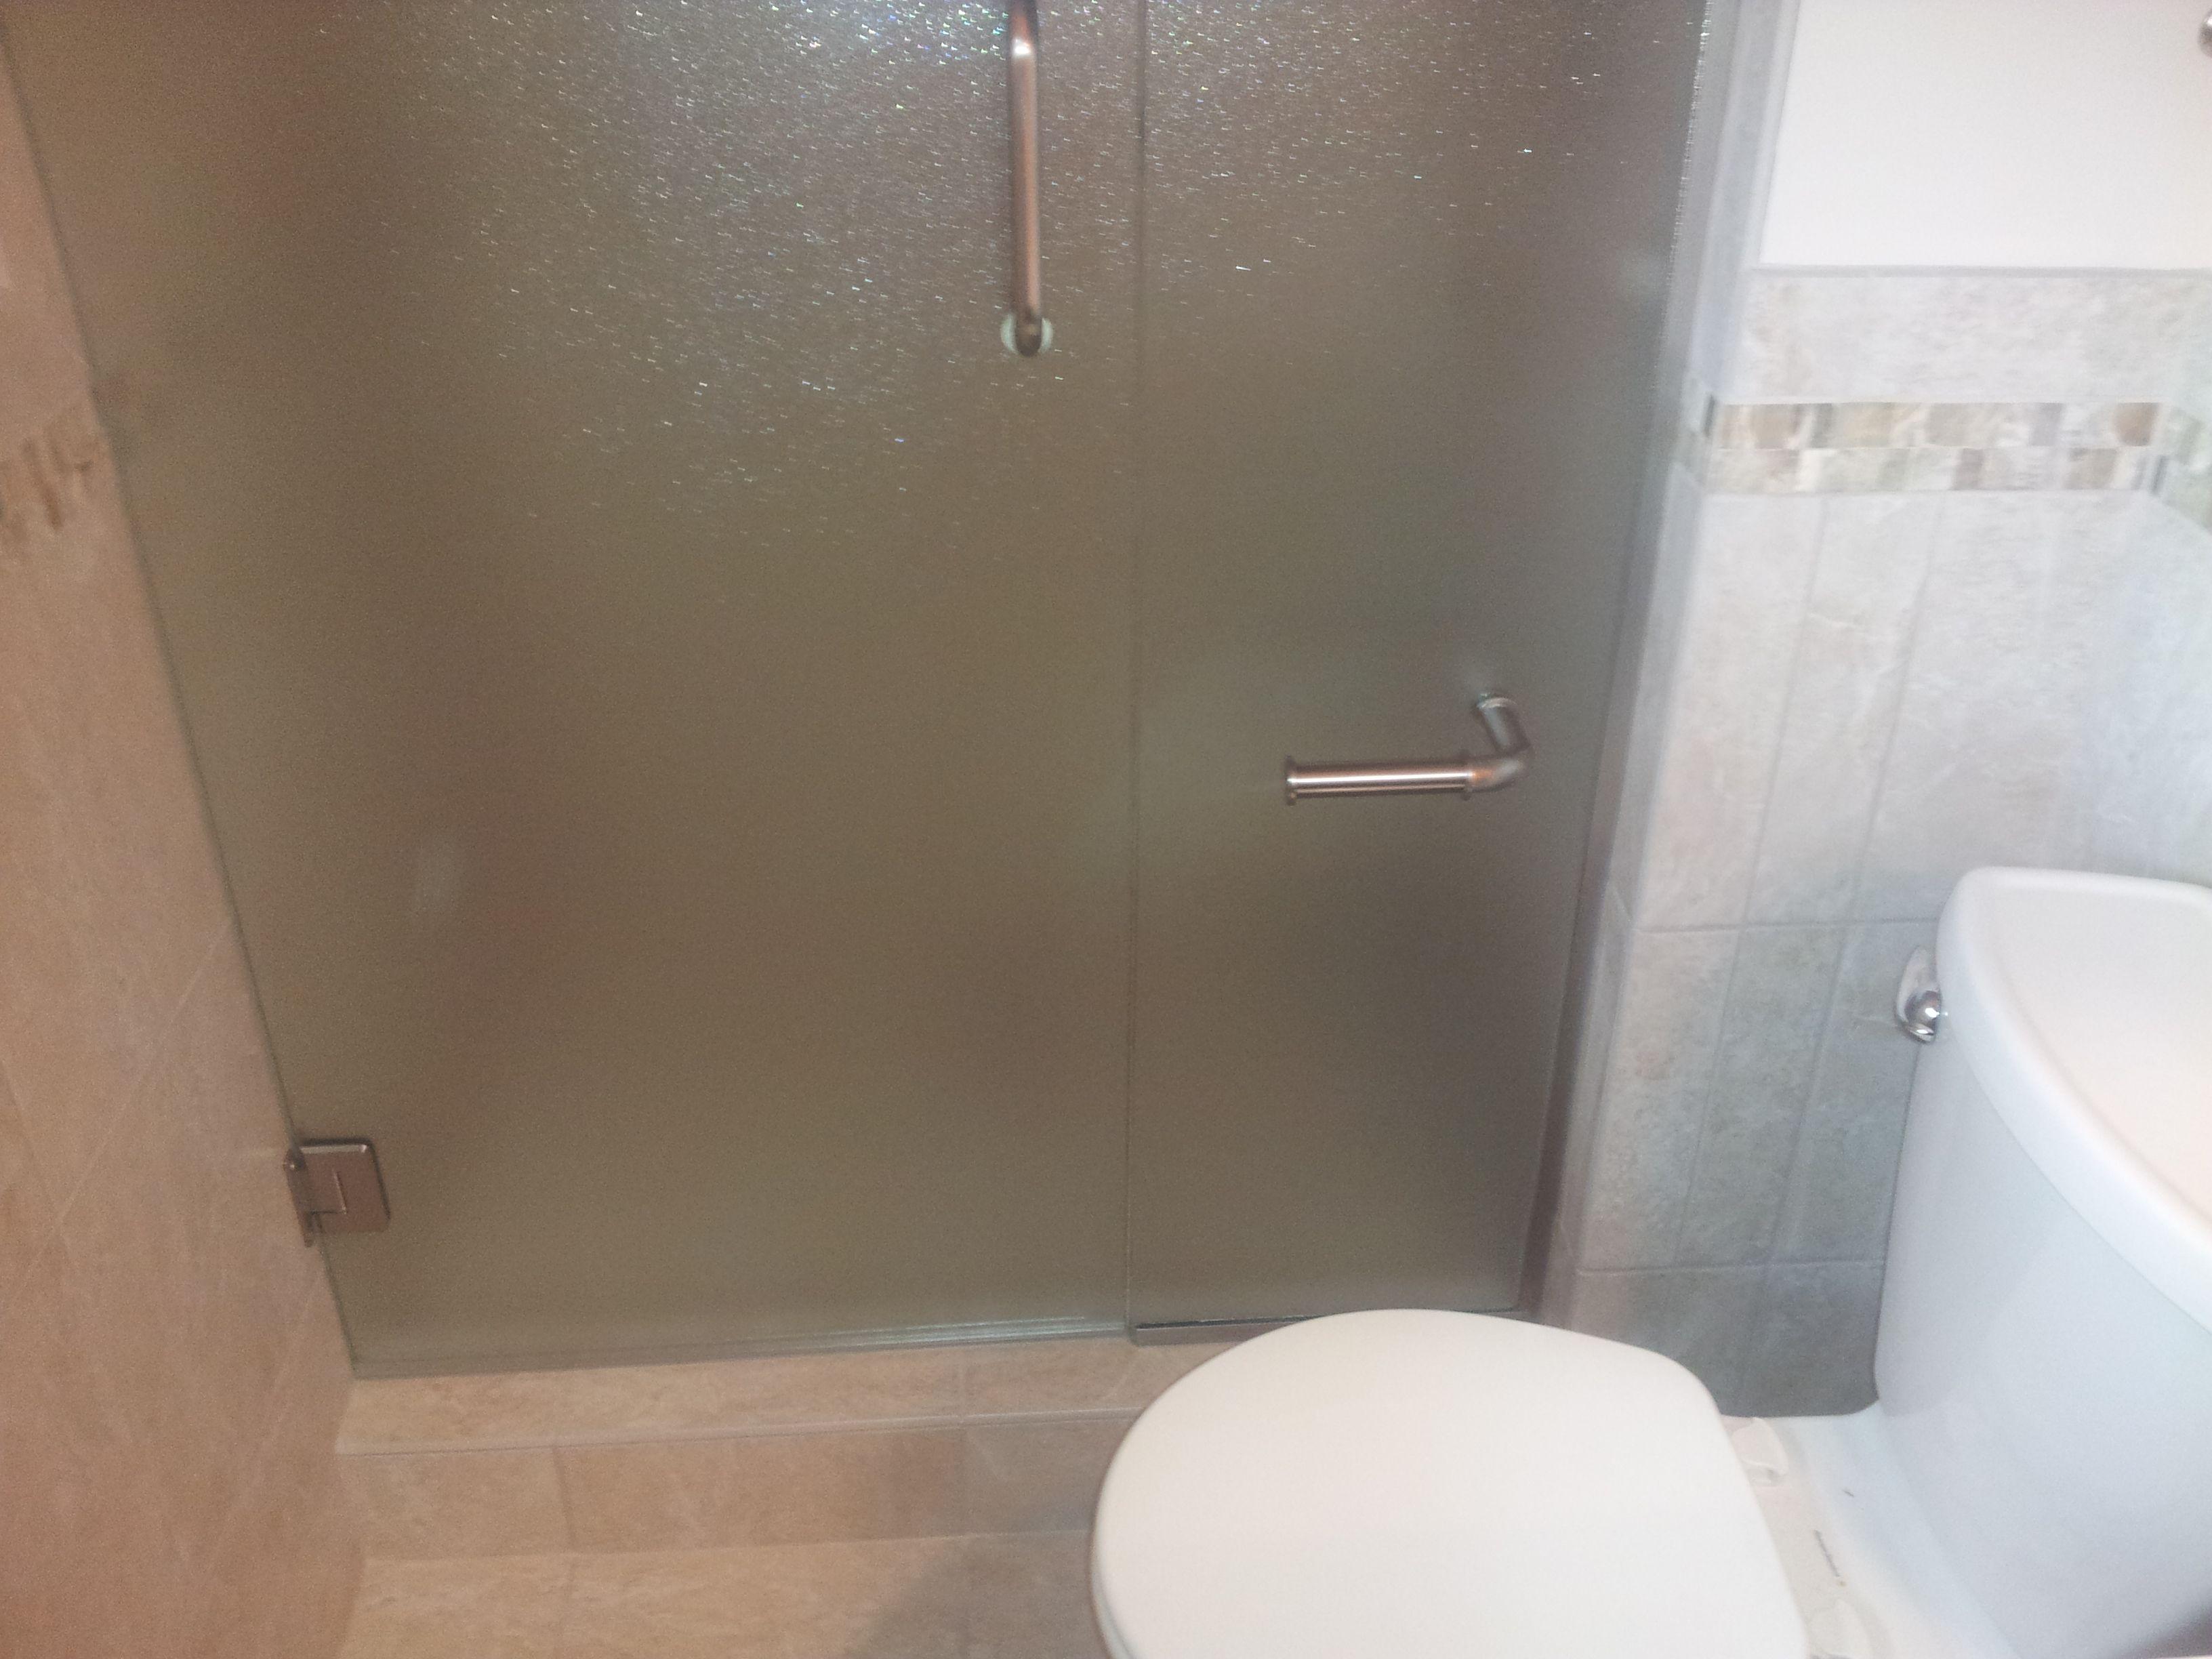 Frameless Rain Glass Enclosure With Toilet Paper Holder